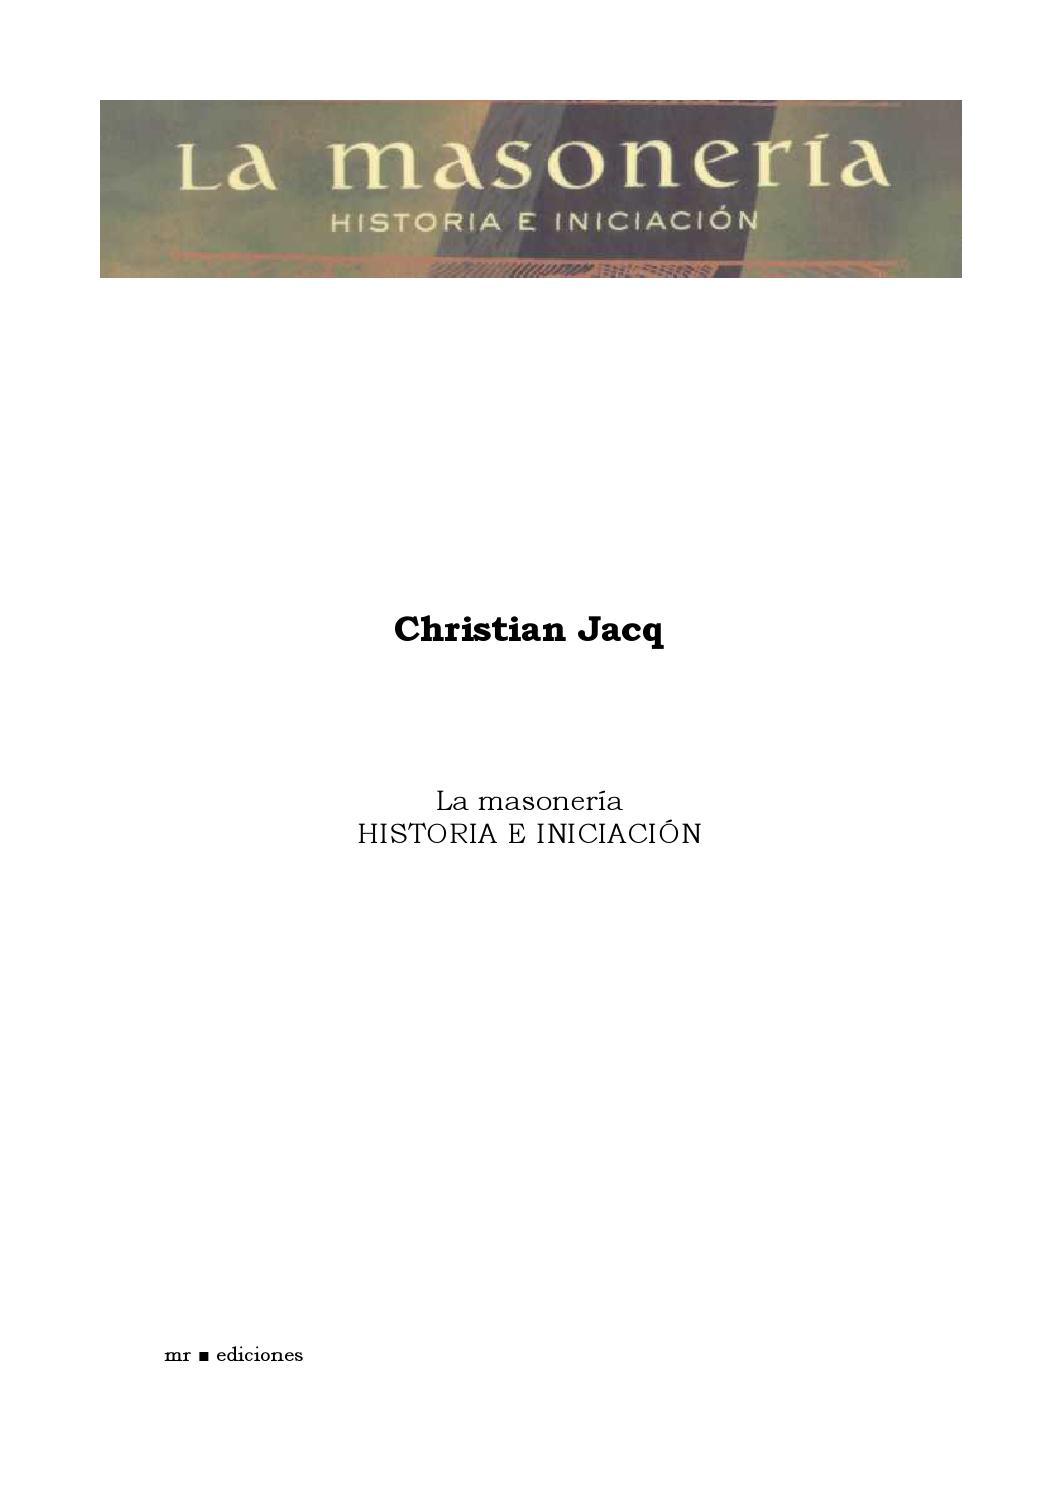 Christian jacq la masoneria historia e iniciacion by Will Eede - issuu